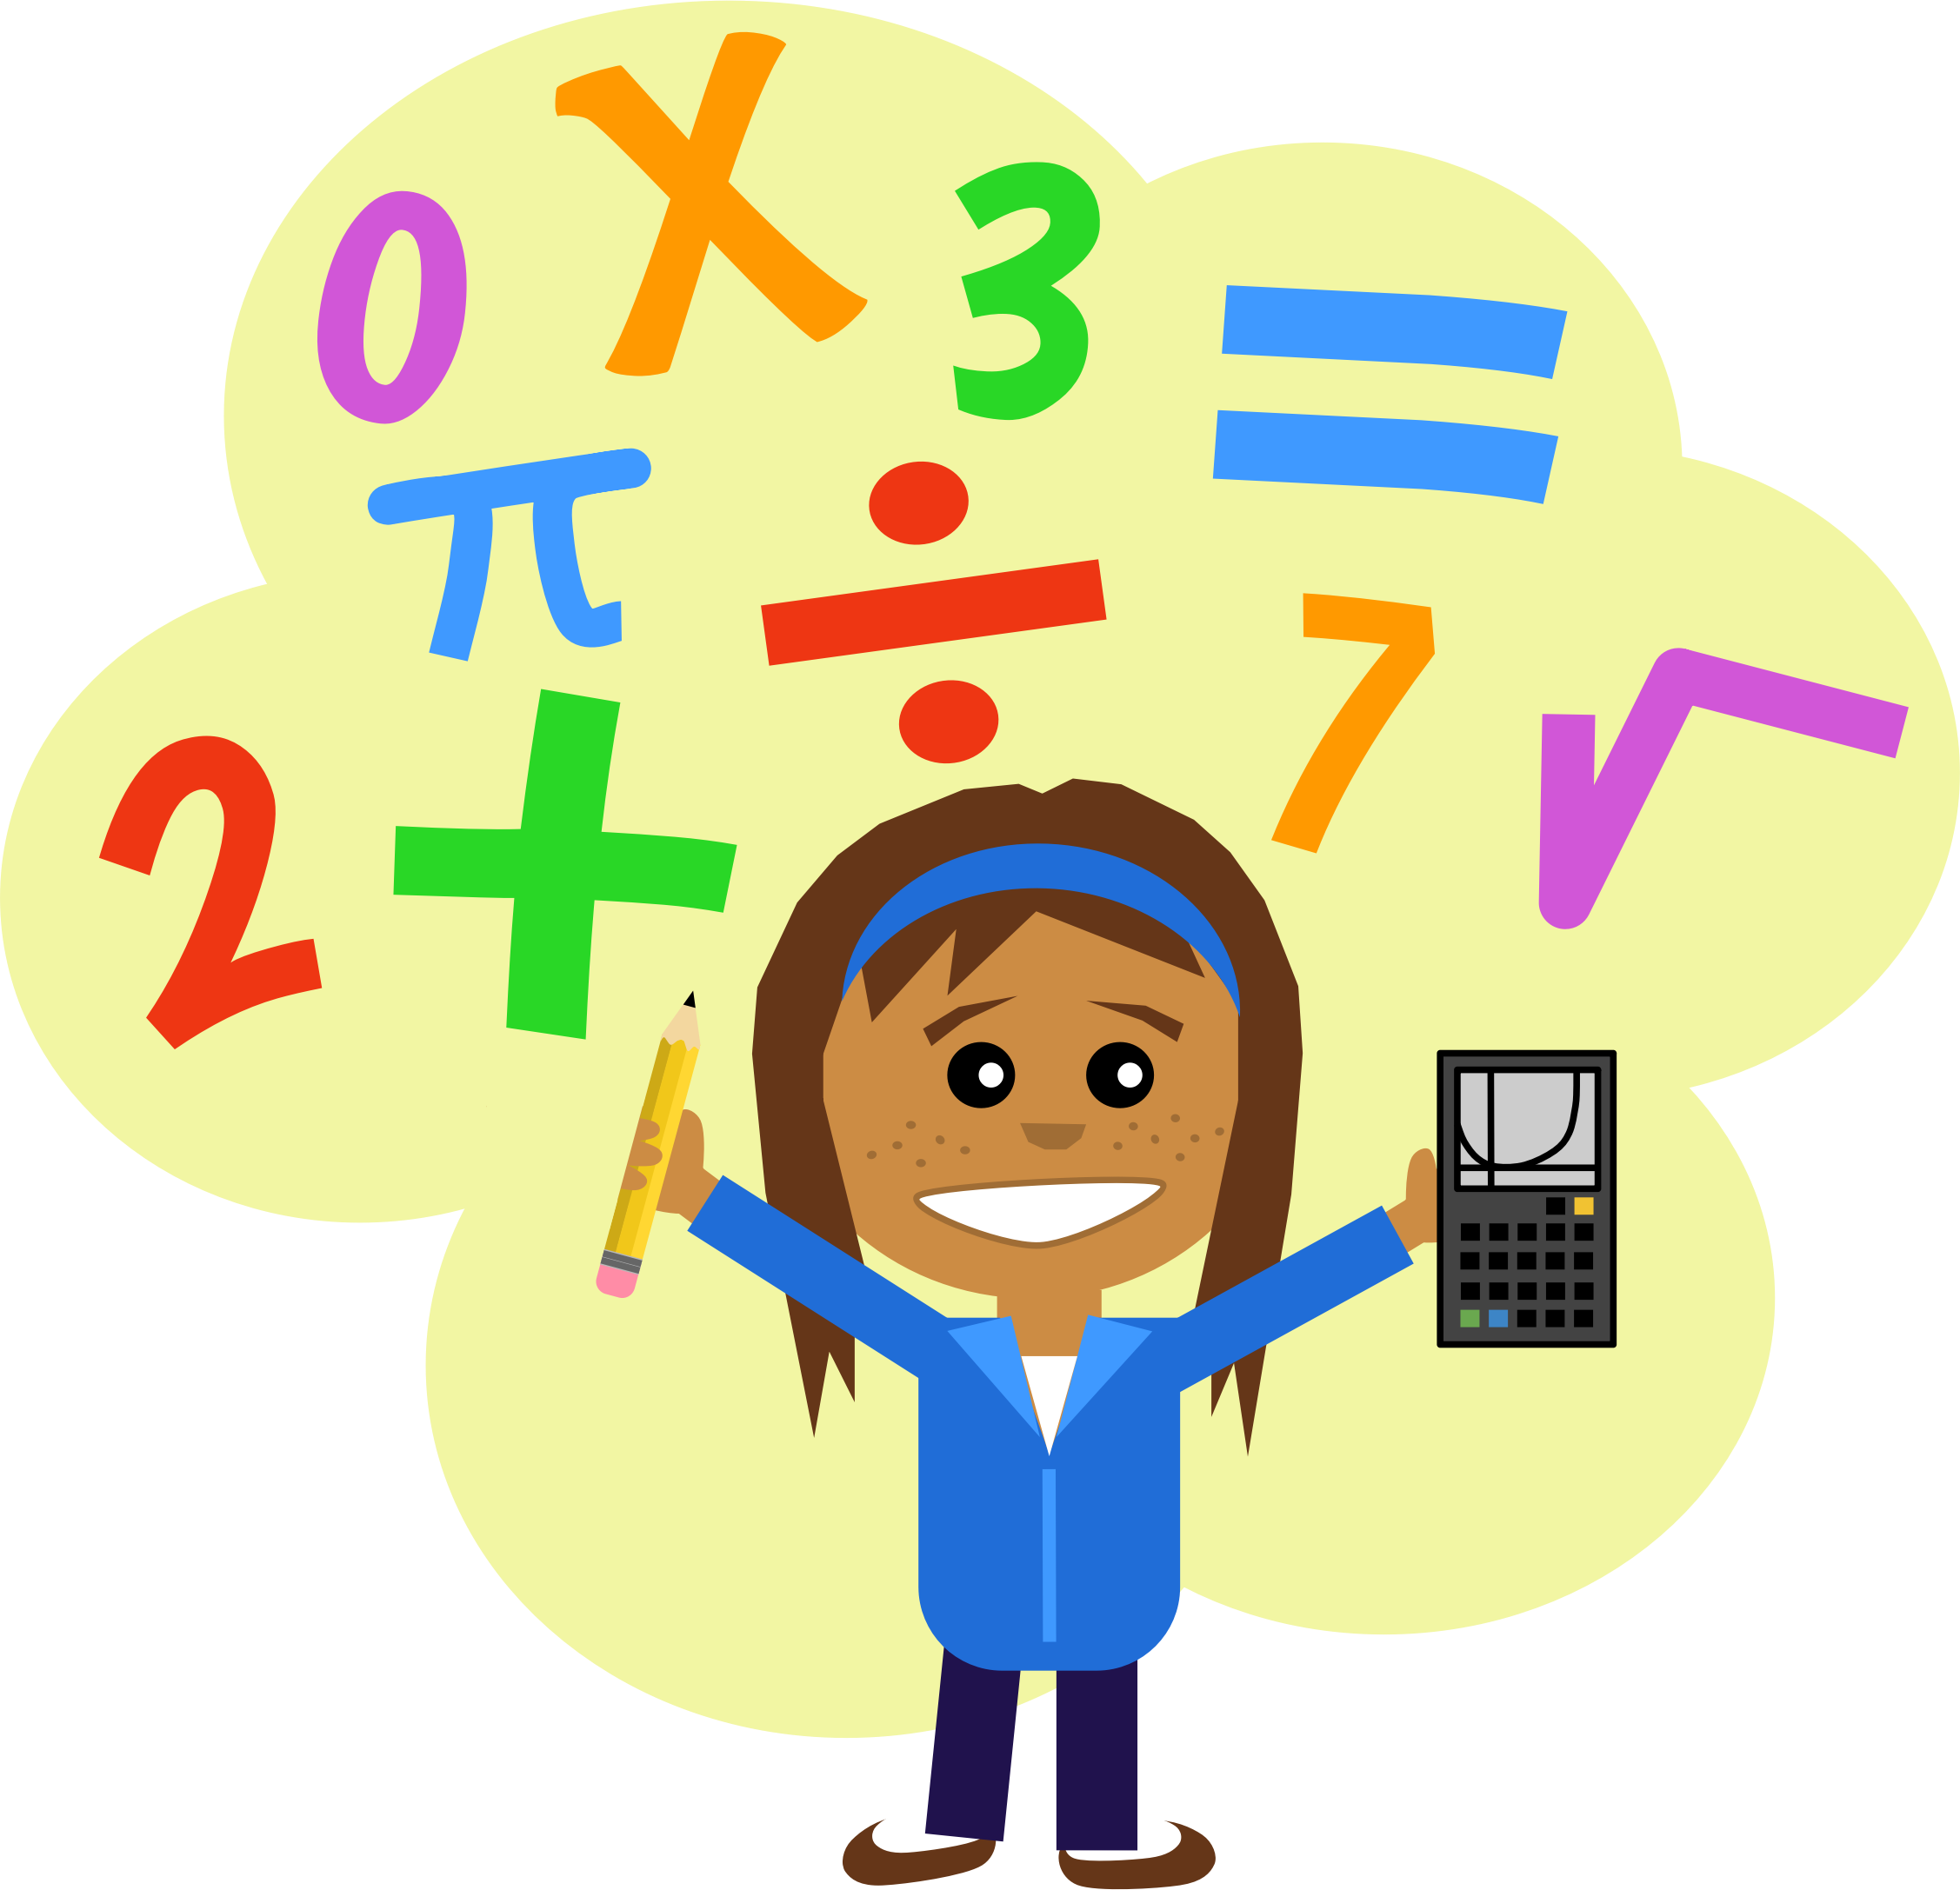 2254x2174 Image Result For Maths Symbols Clipart Matthhhssss Pllus